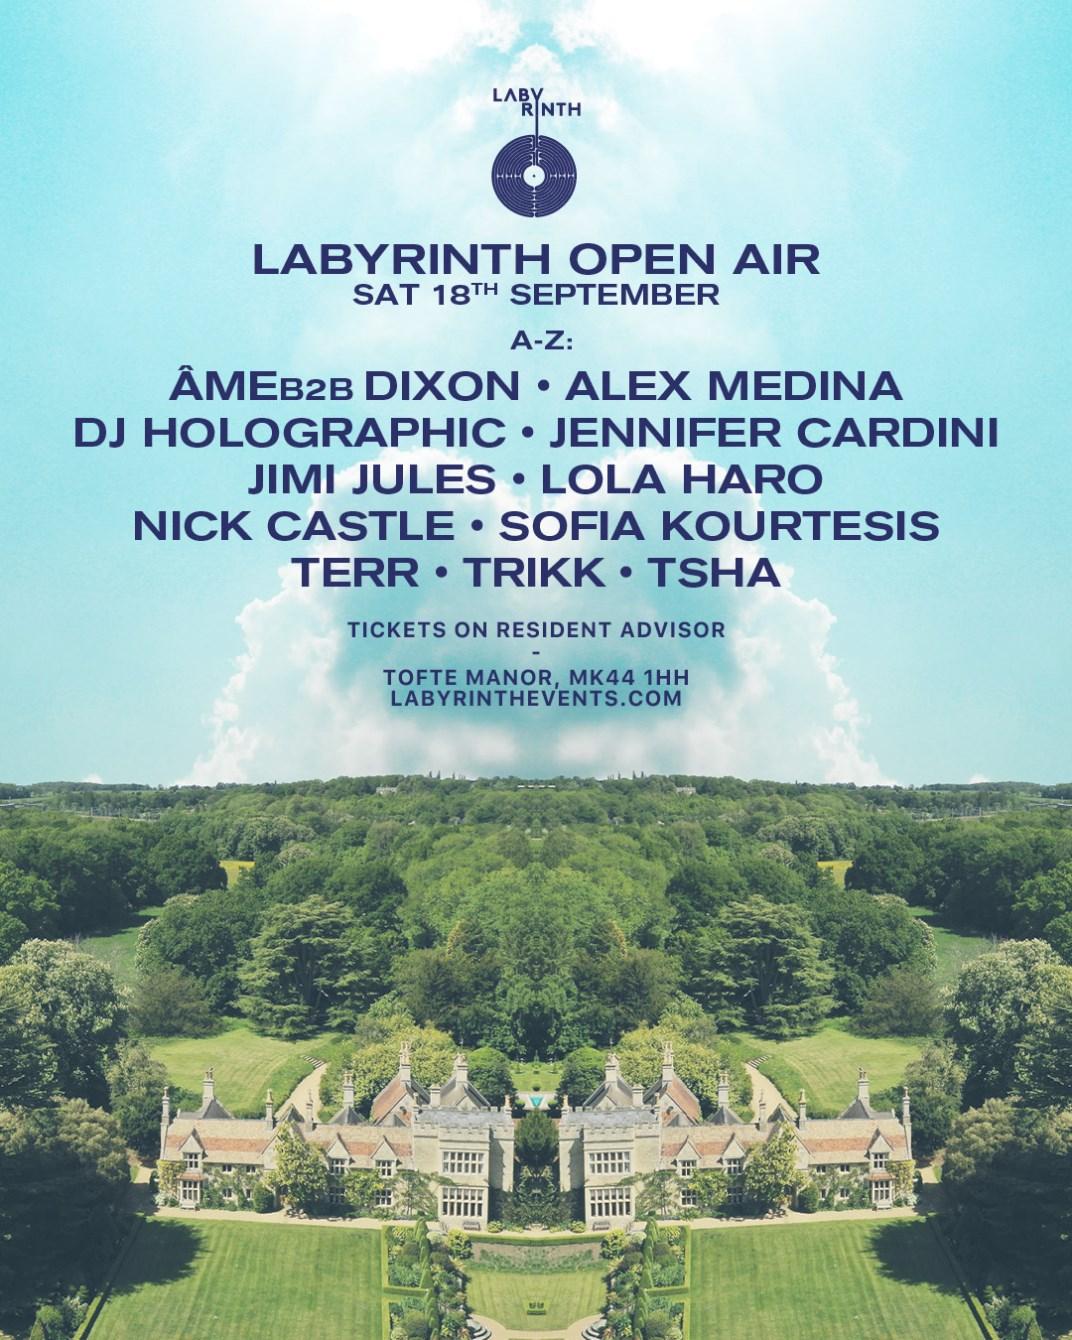 Labyrinth Open Air: Âme b2b Dixon & More - Flyer front